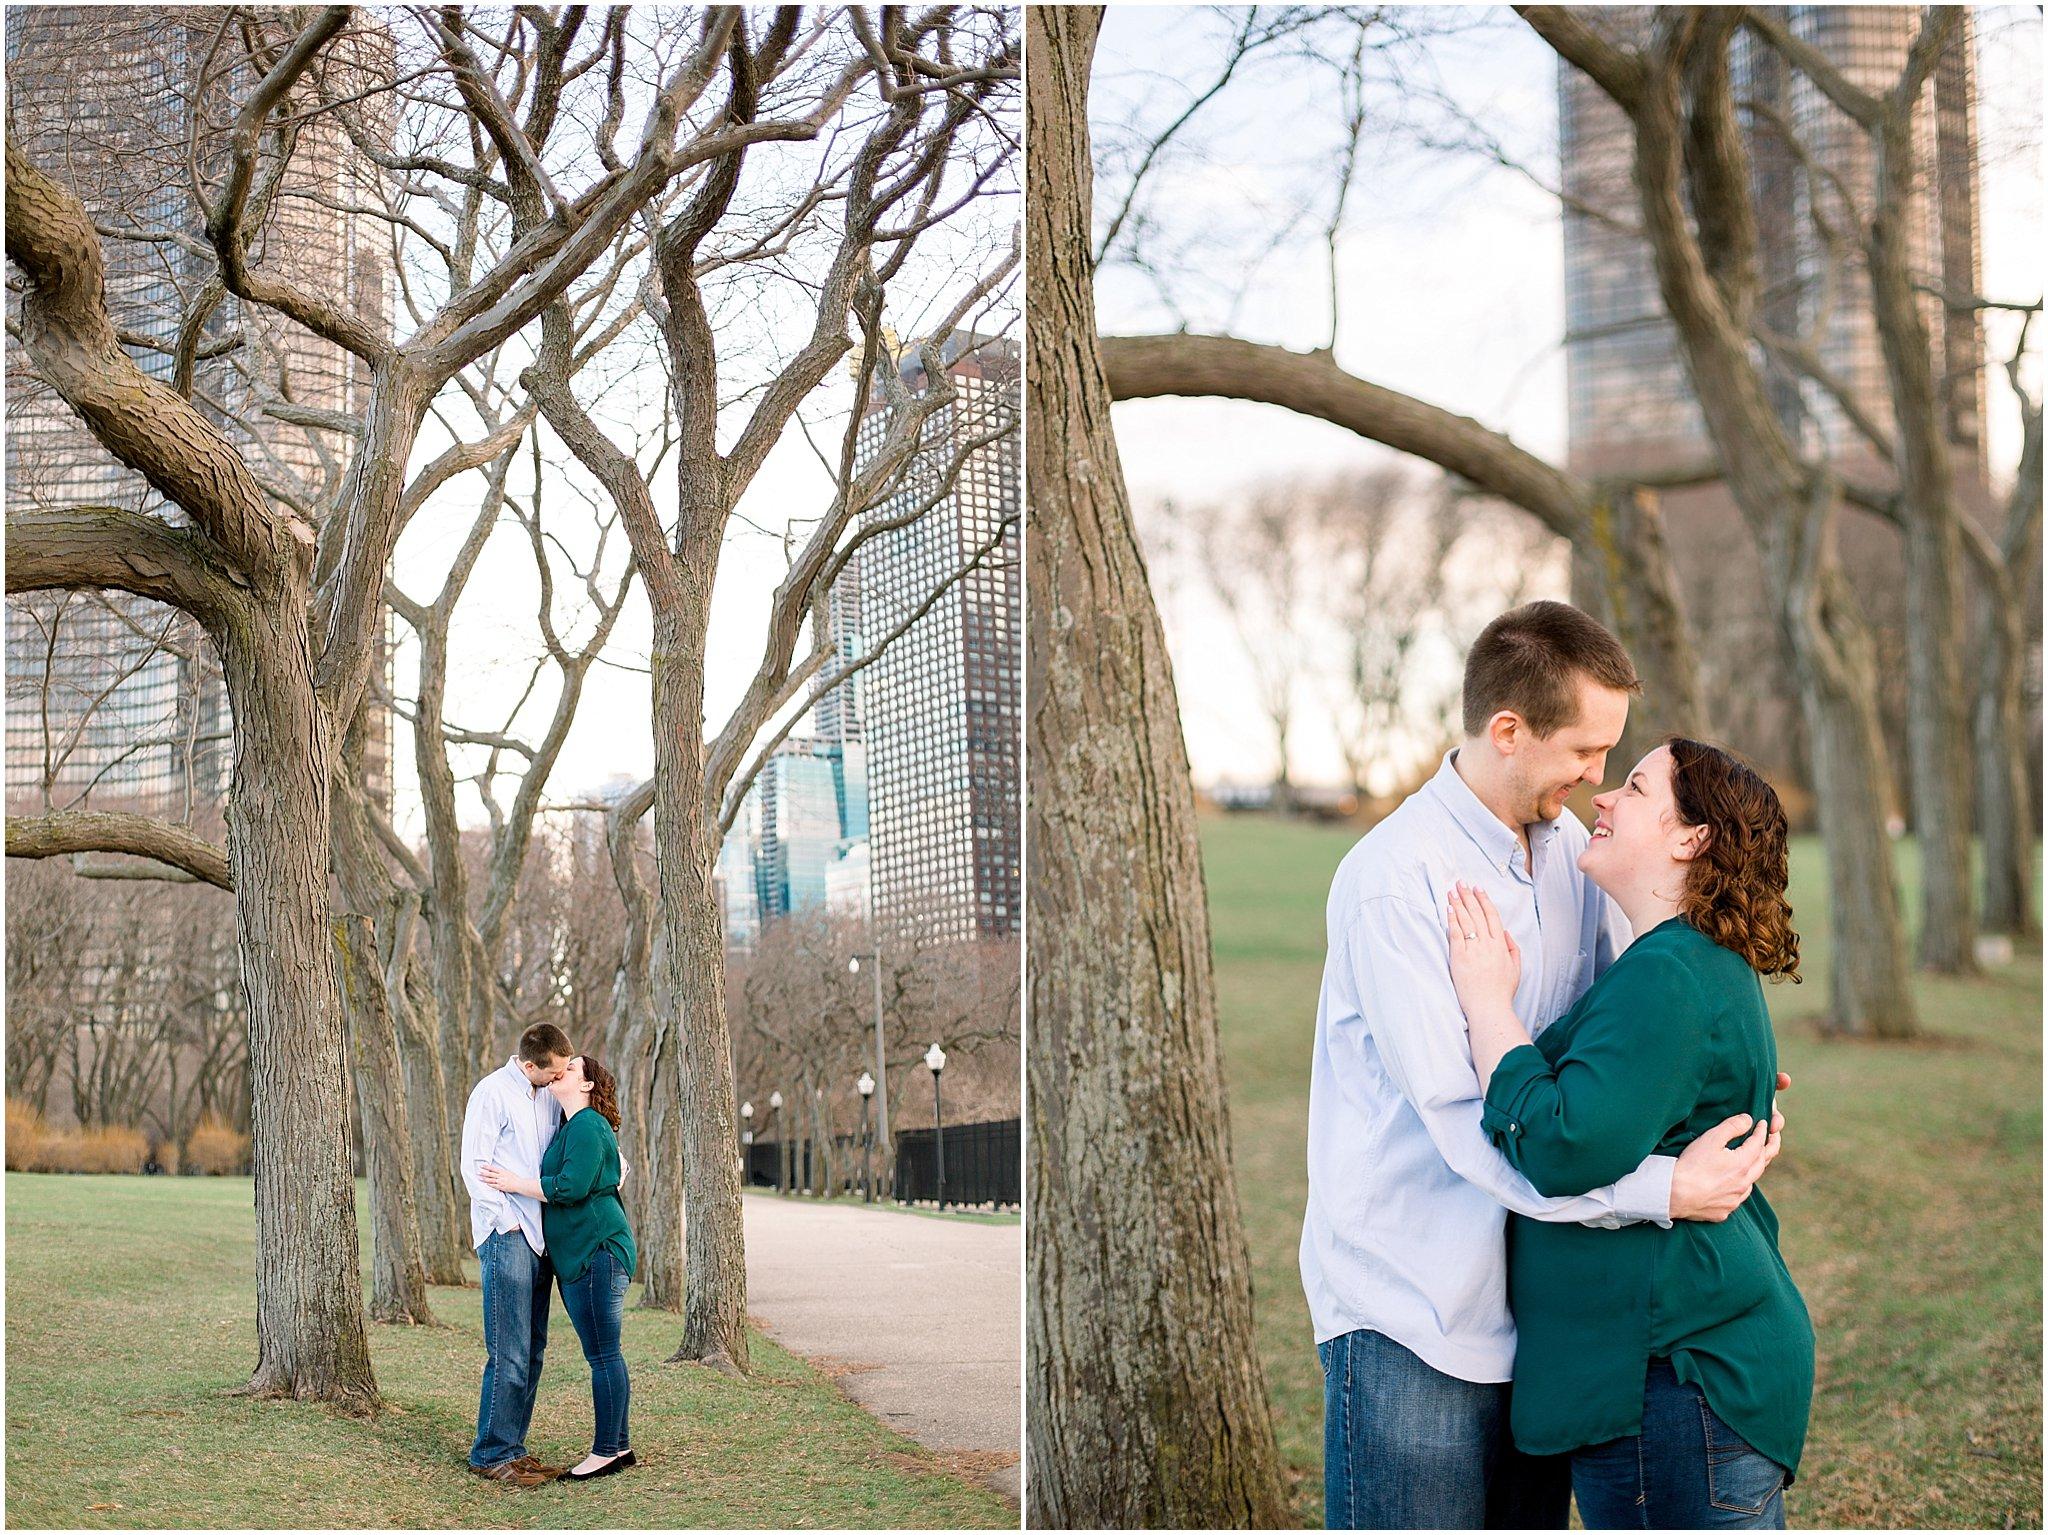 olive-park-engagement-photos_0019.jpg